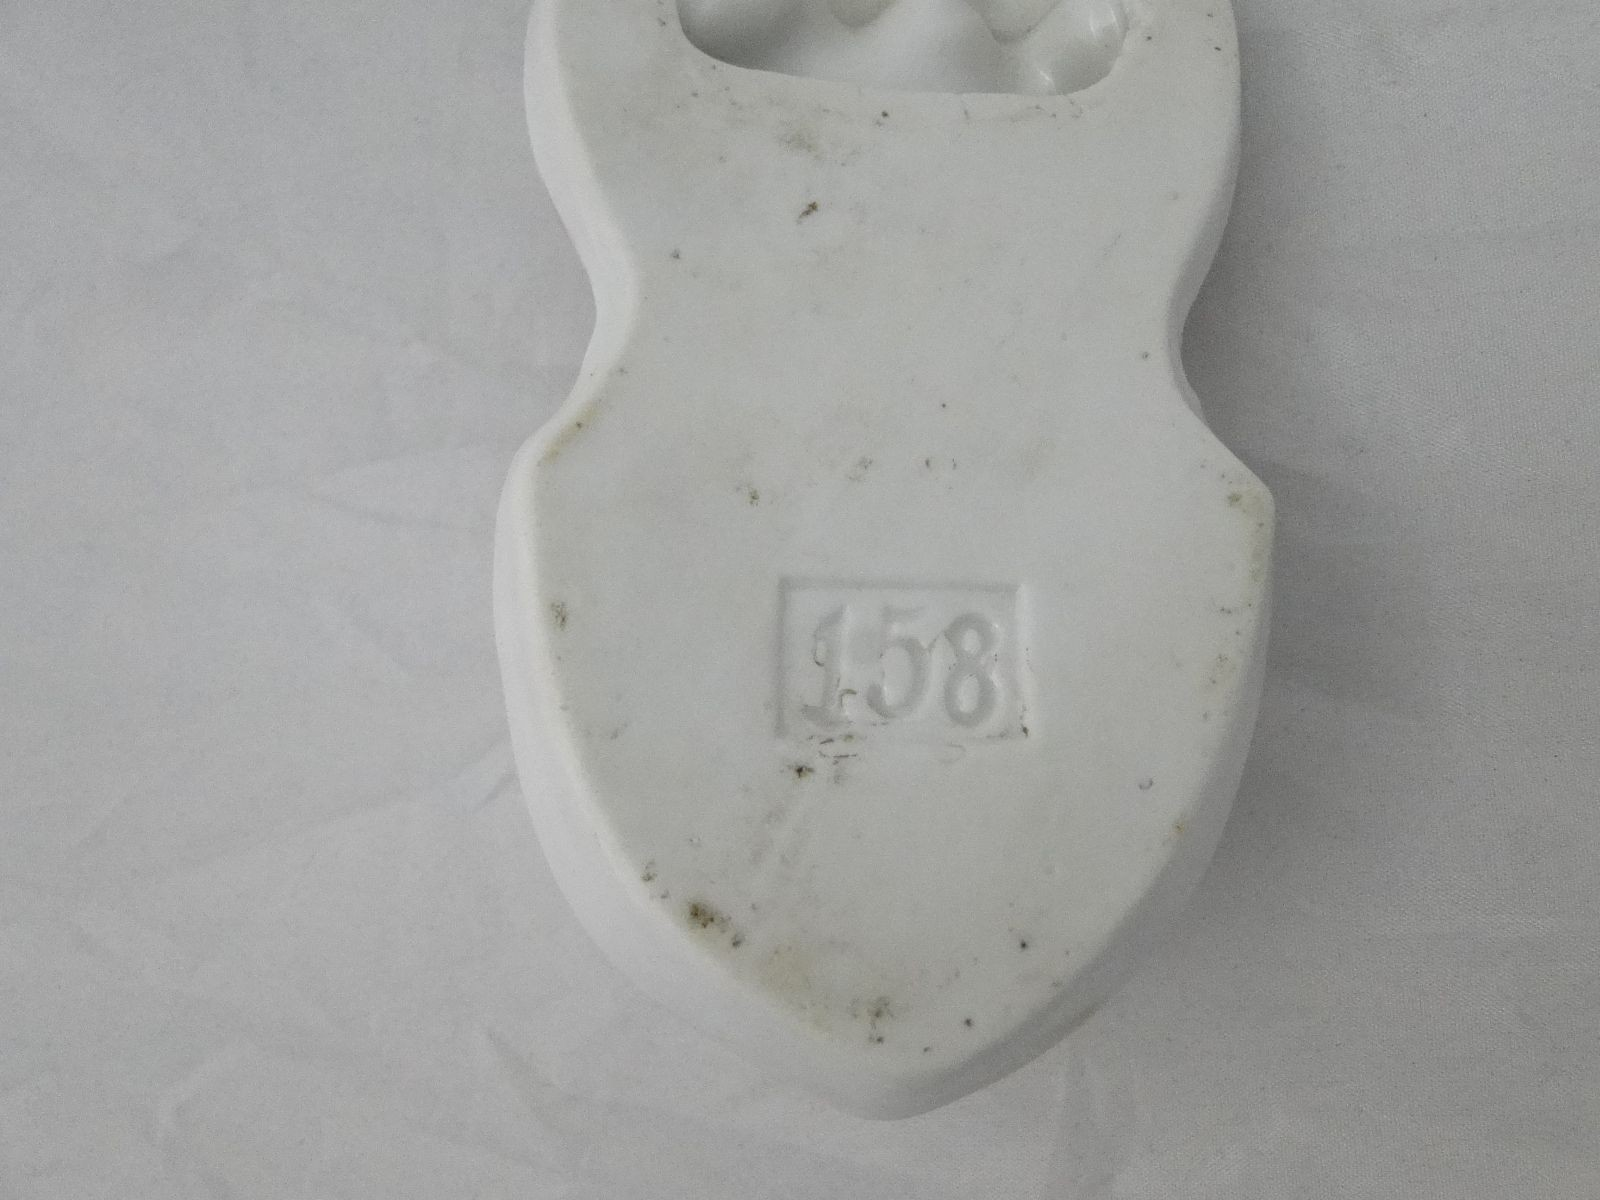 DSC09378.JPG (1600×1200)